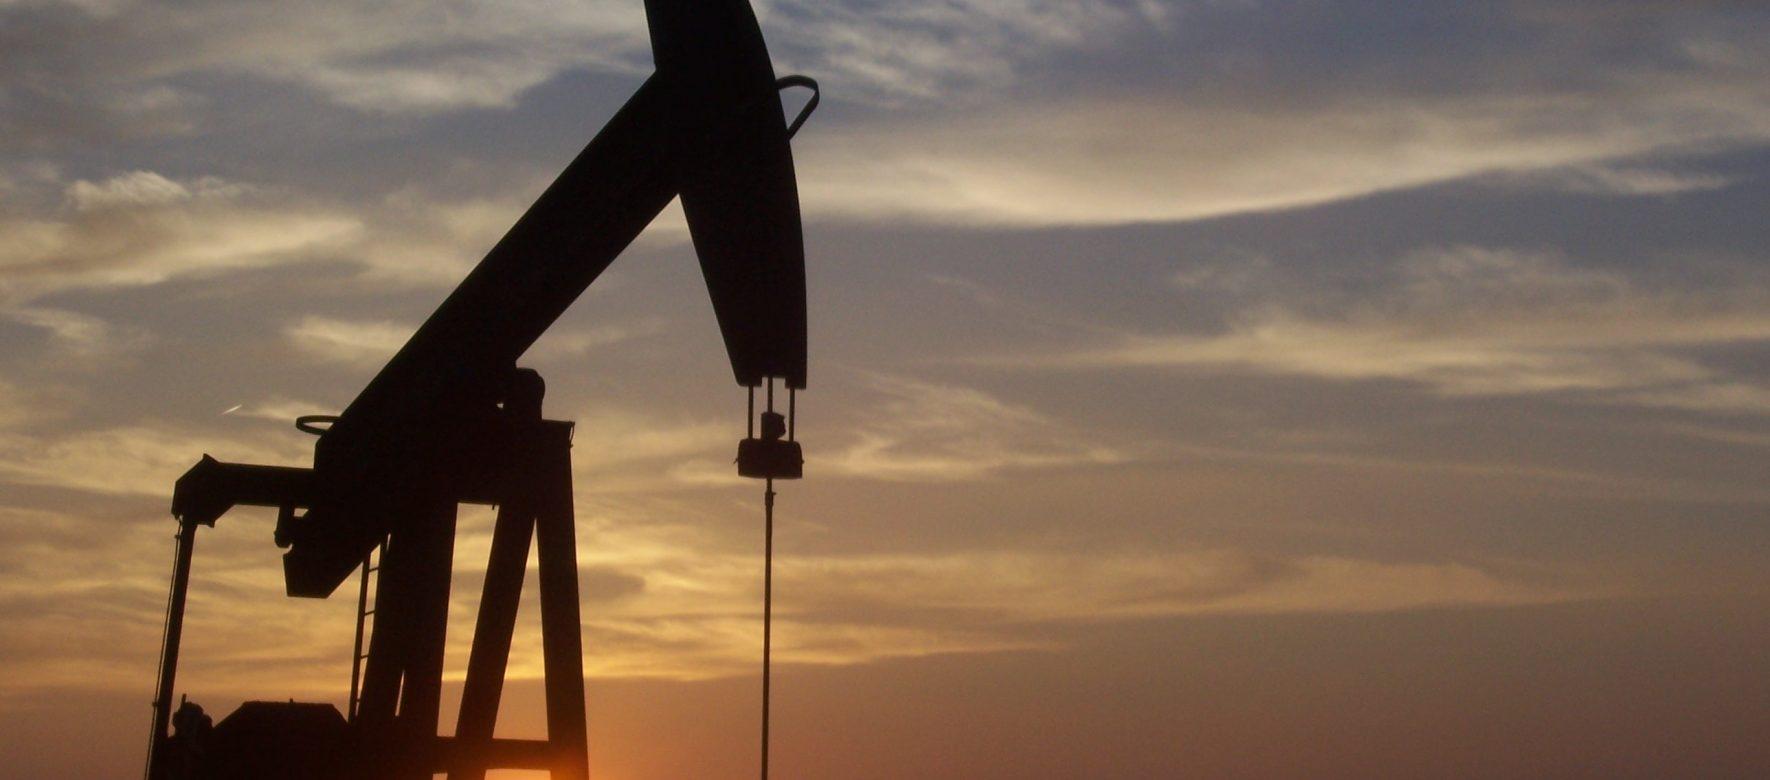 Egypte : Dragon Oil va investir 1 milliard de dollars dans le golfe de Suez